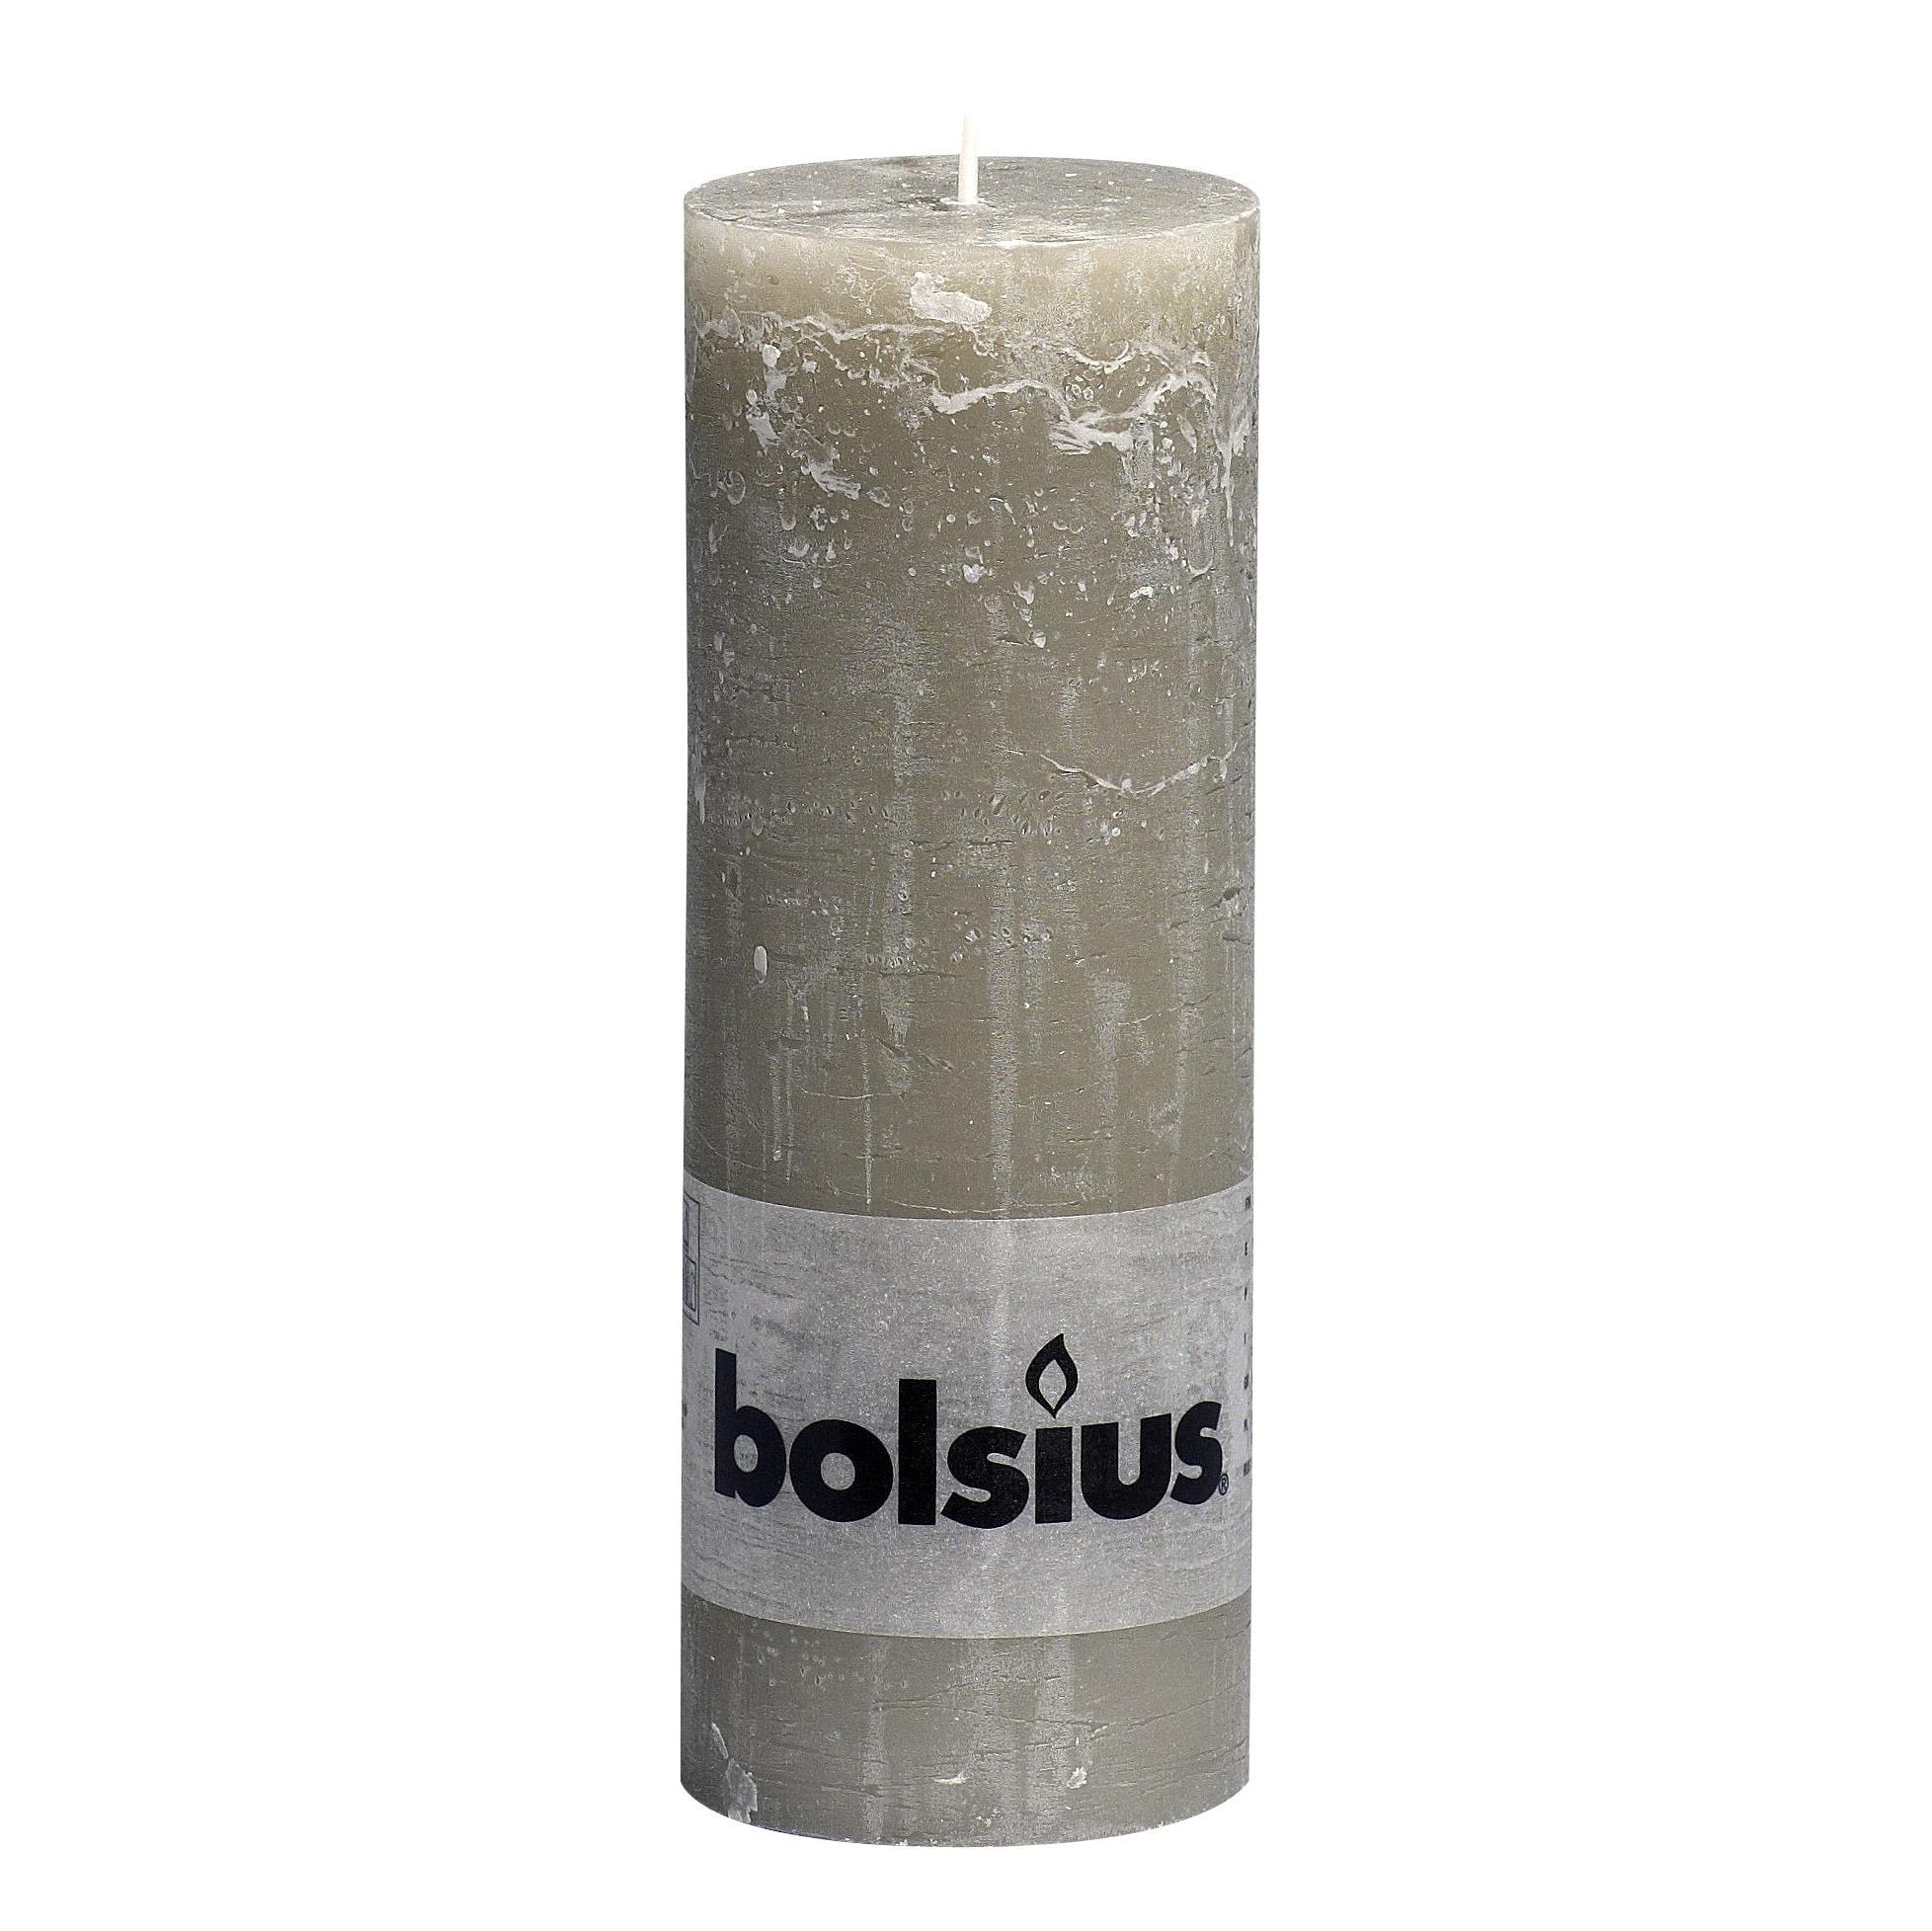 Фото - Свеча Bolsius block Rustic Metallic 19x6,8 см каменно-бежевая свеча bolsius rustic metal gold 8х6 8 см